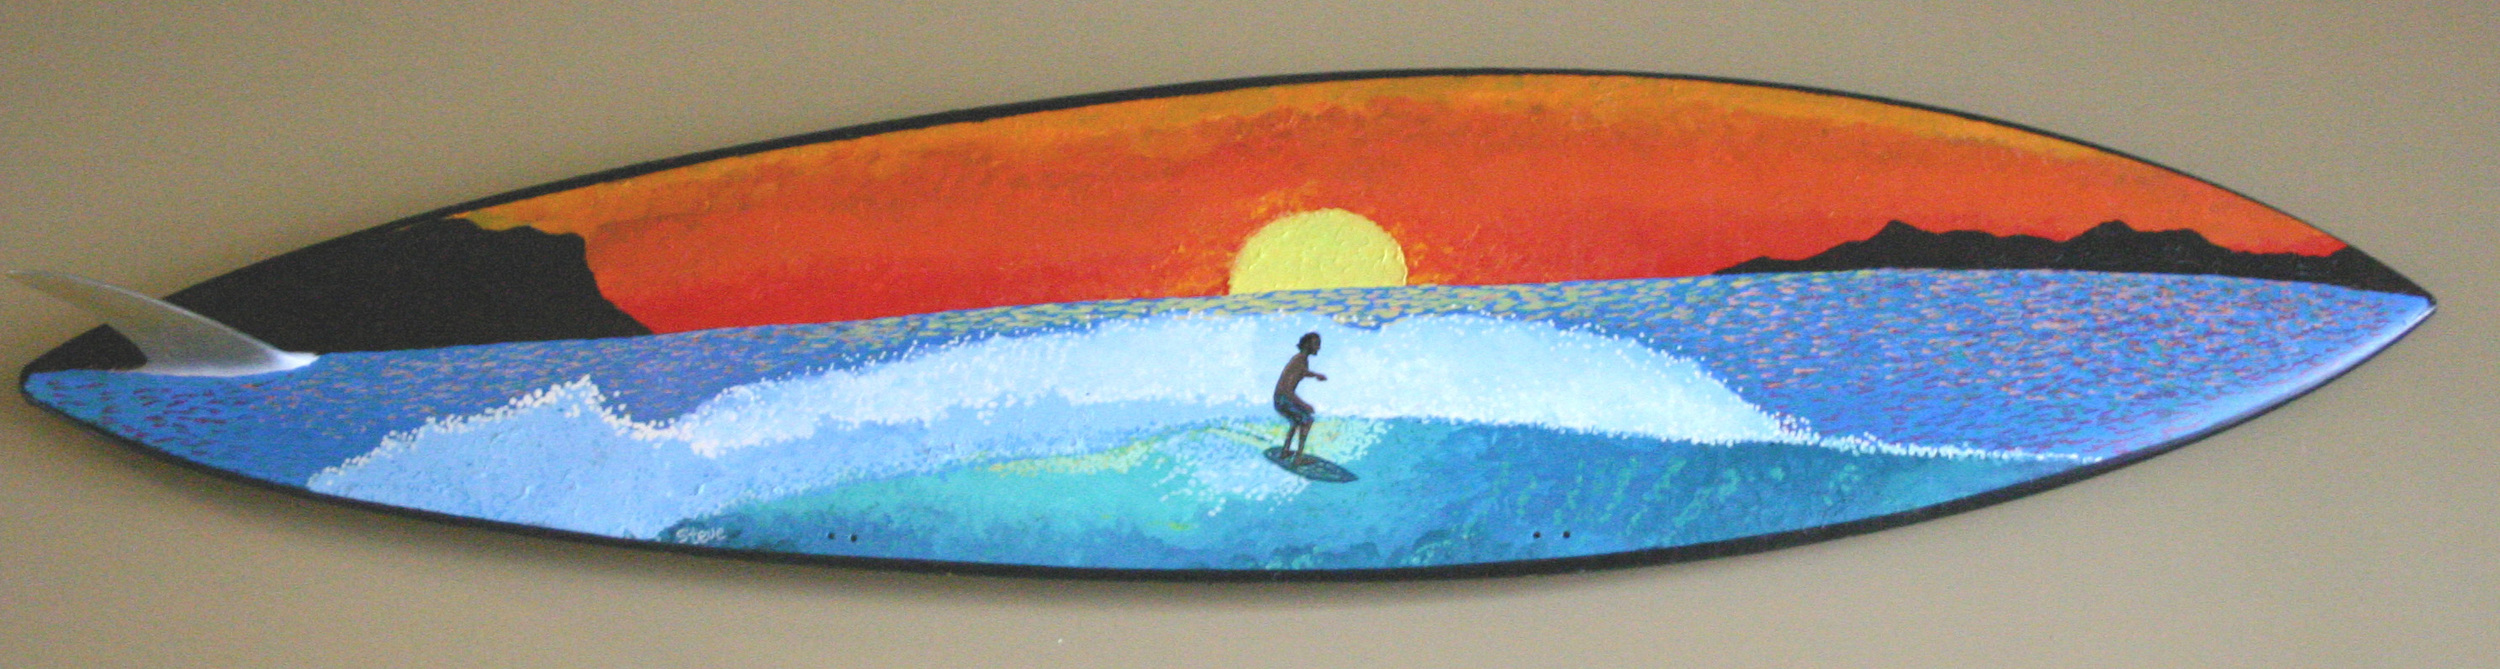 Sunset Surfer  acrylic on surfboard  sold